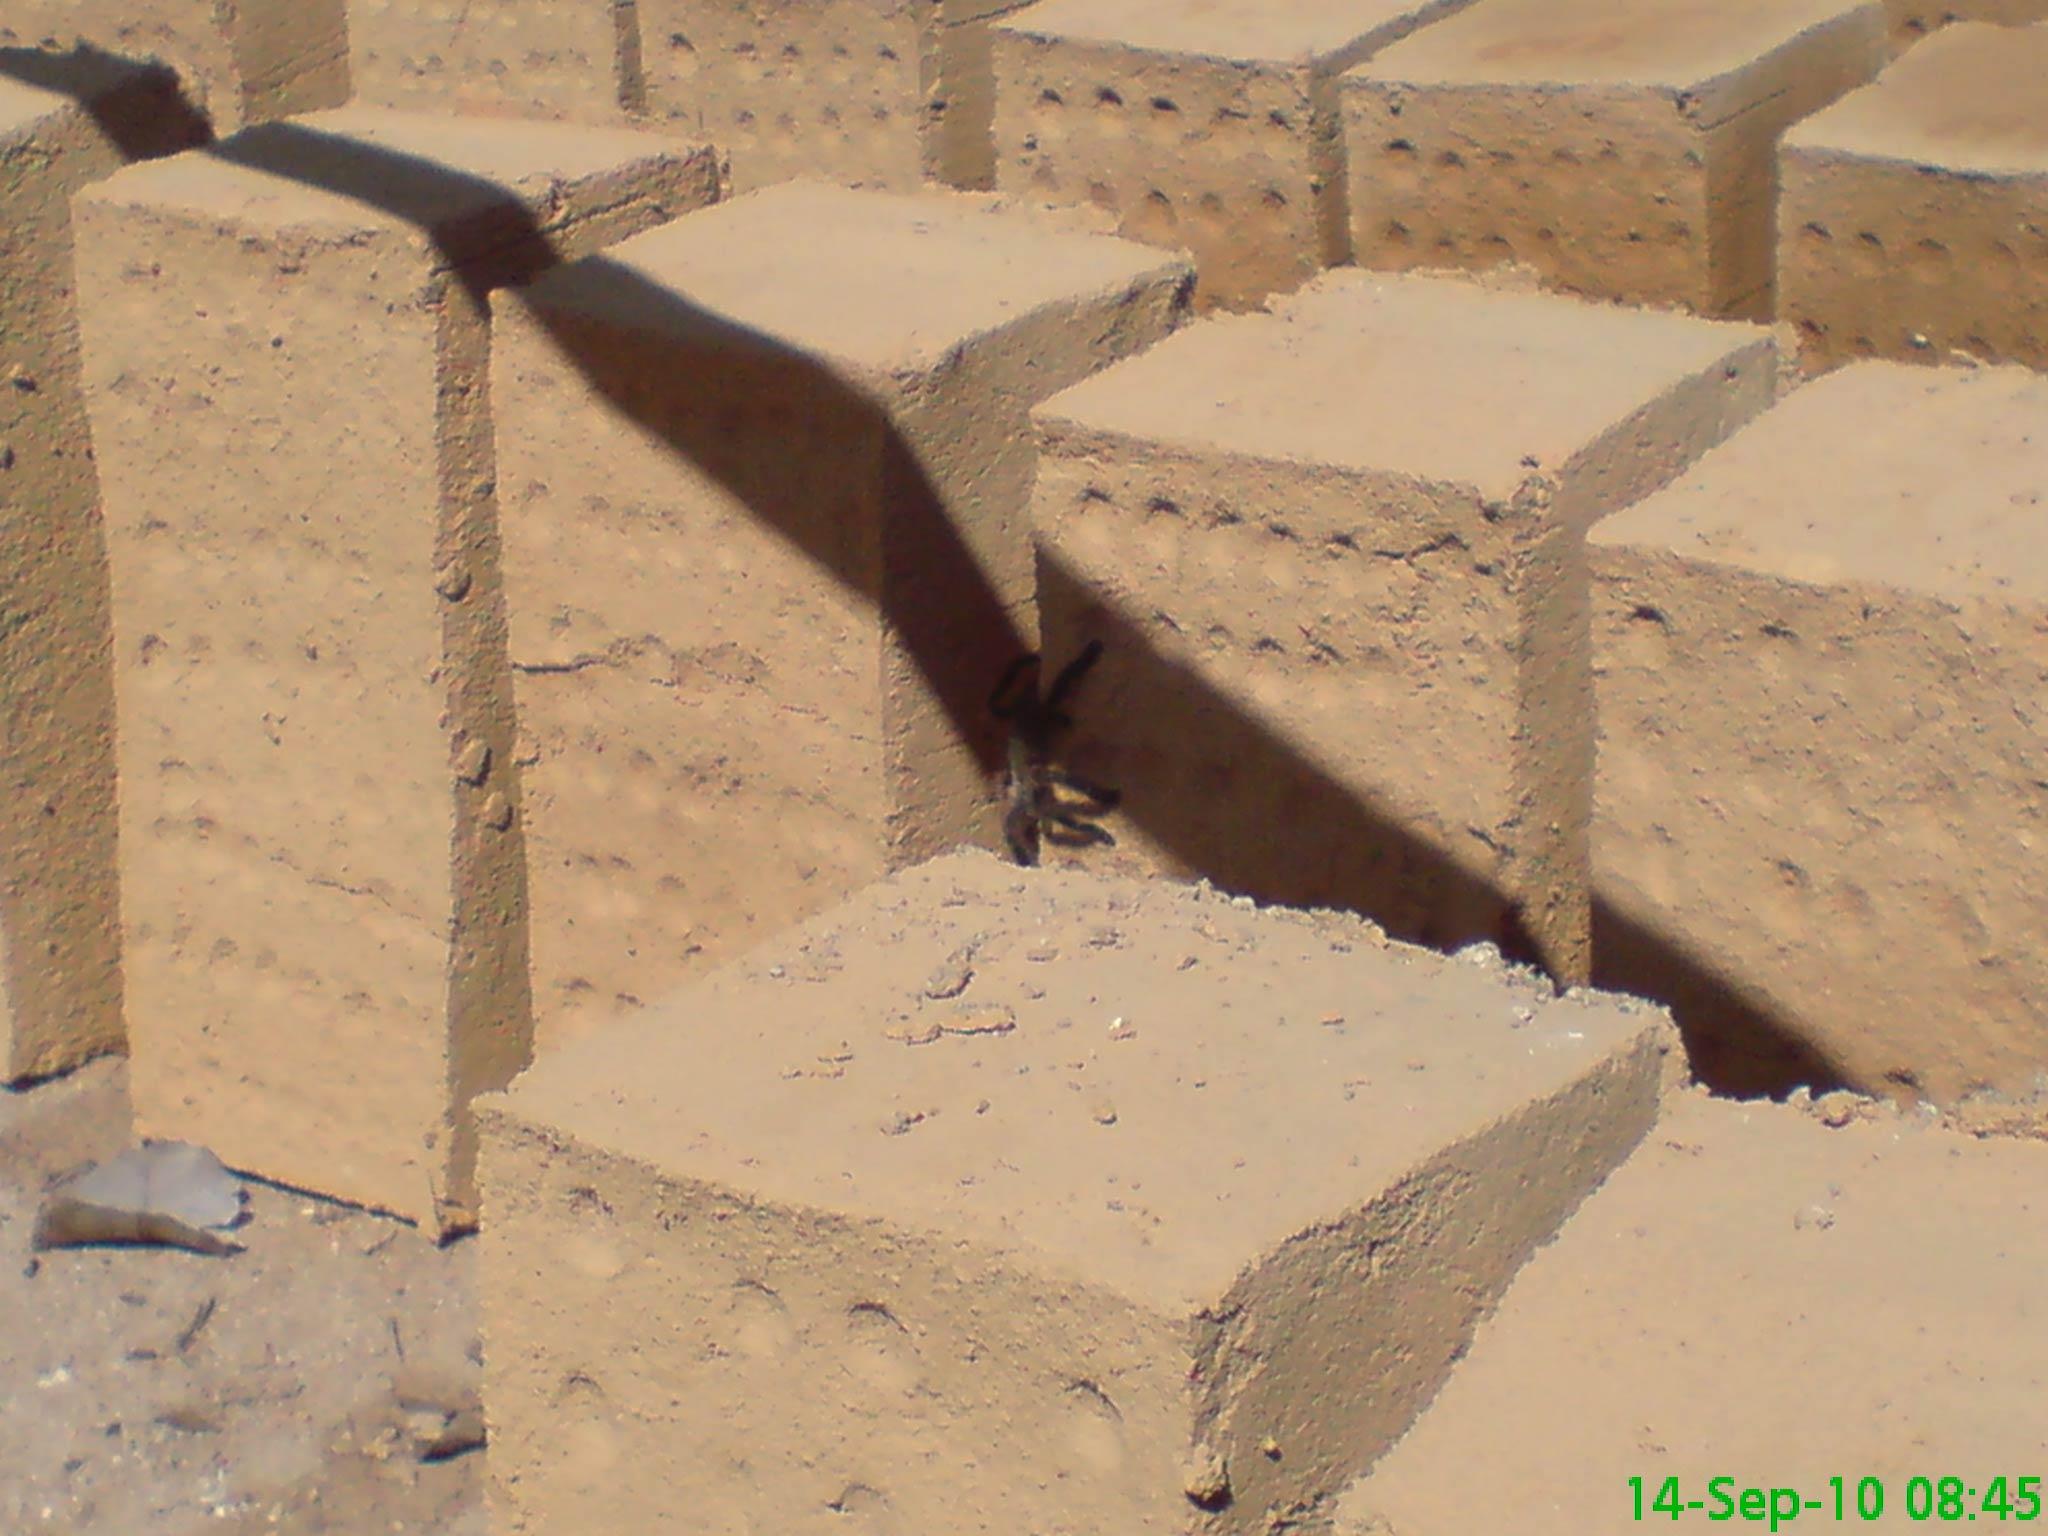 Proceso de secado al sol de los adobes by D. Ferrari, Casa de Barro Arraial D'Ajuda